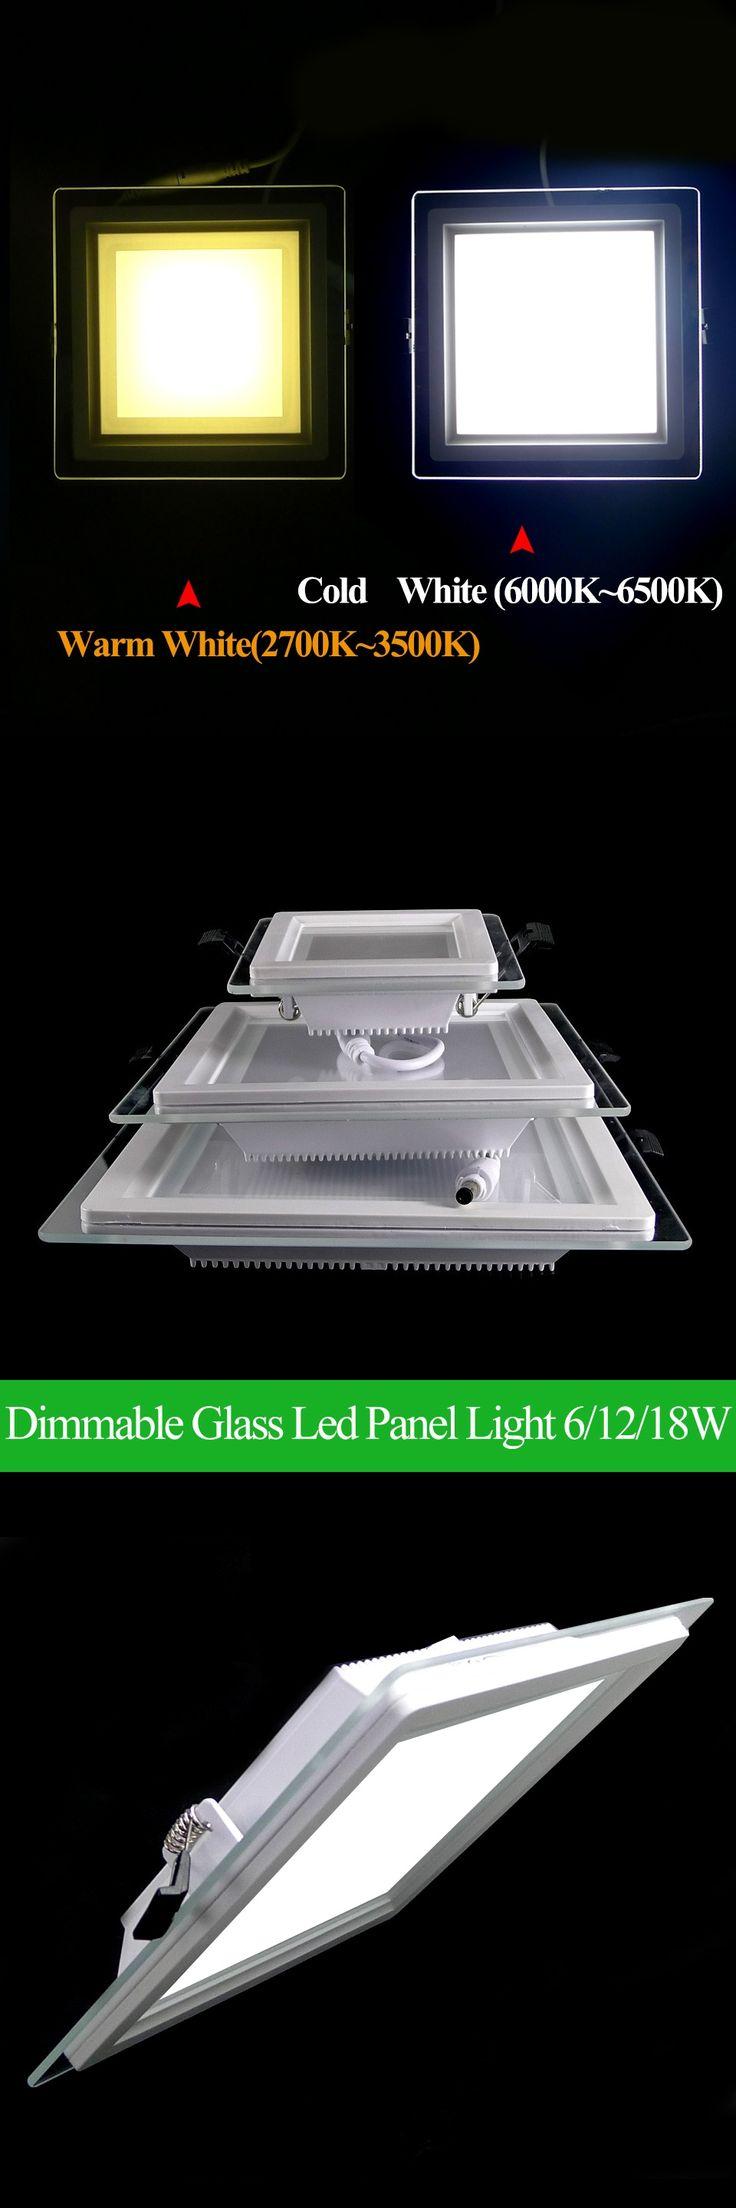 Dimmable LED Panel Downlight Super Bright Glass Square Ceiling Recessed Panel Lights SMD 5360 LED Spot Light Bulb AC110V 220V